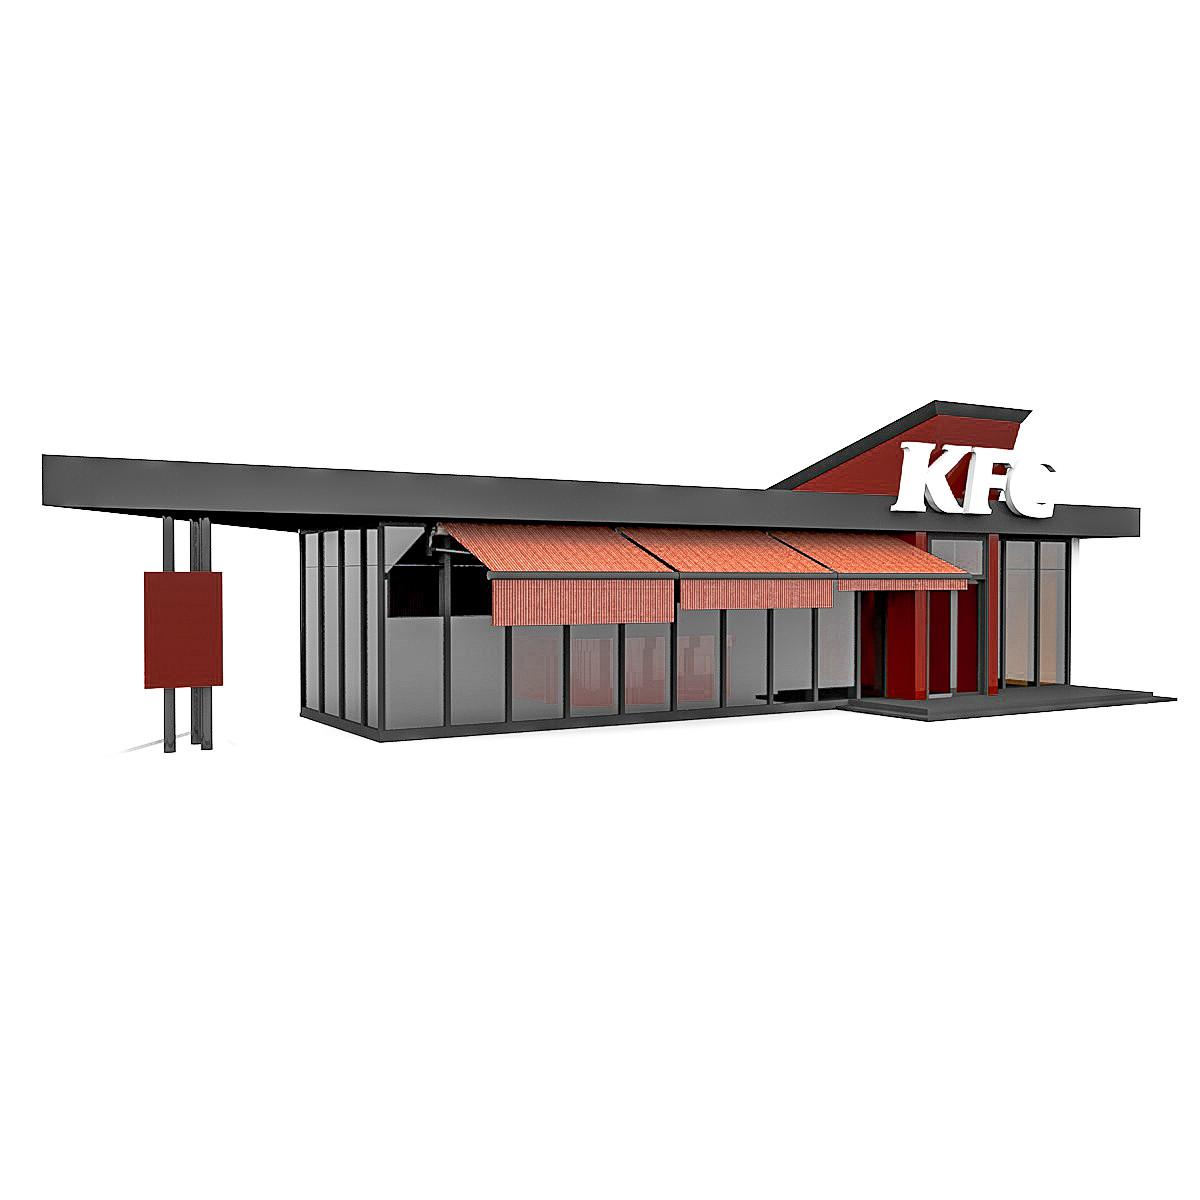 fast food restaurant kfc 3d model